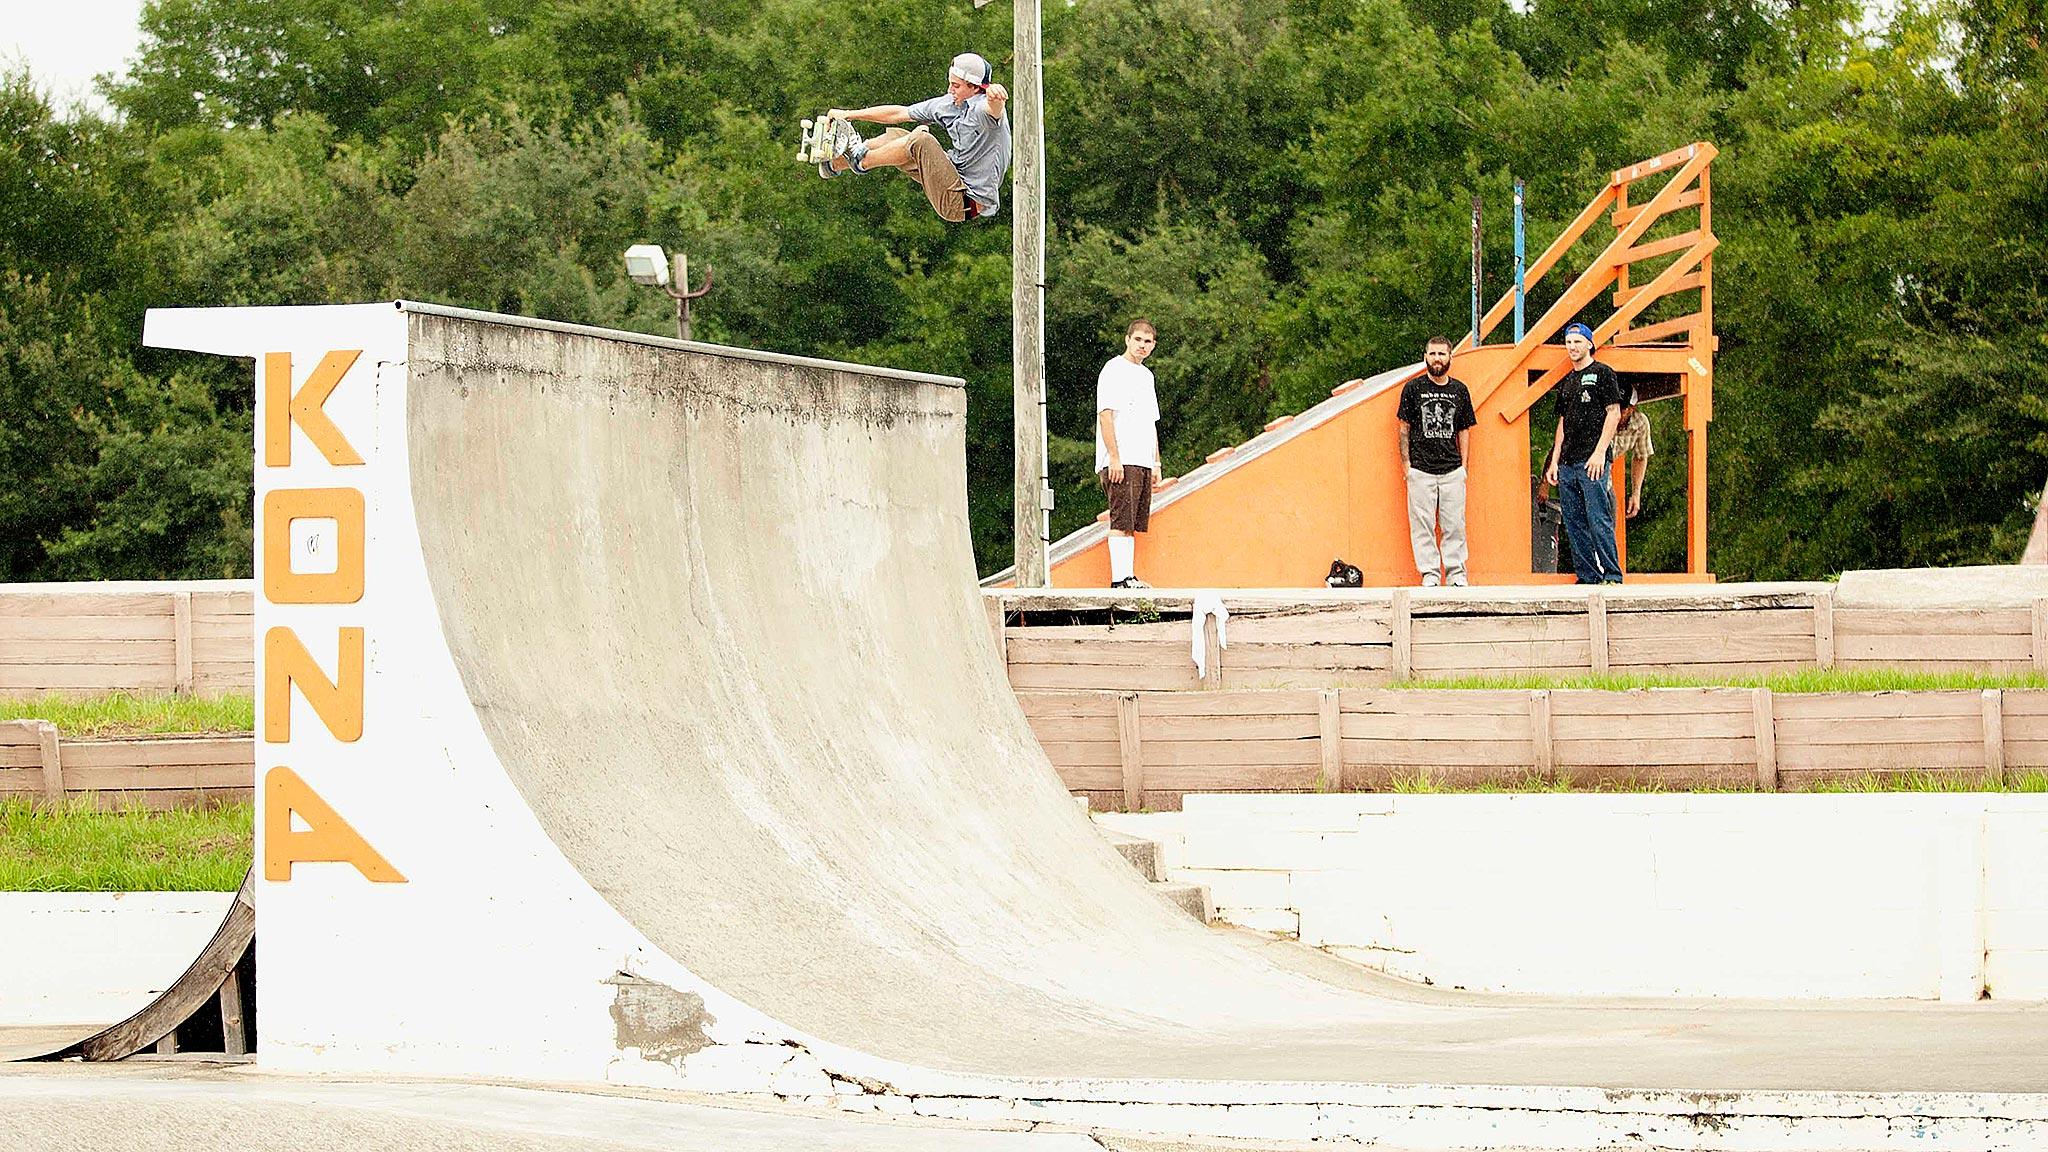 Kona Skatepark, Jacksonville, Fla.